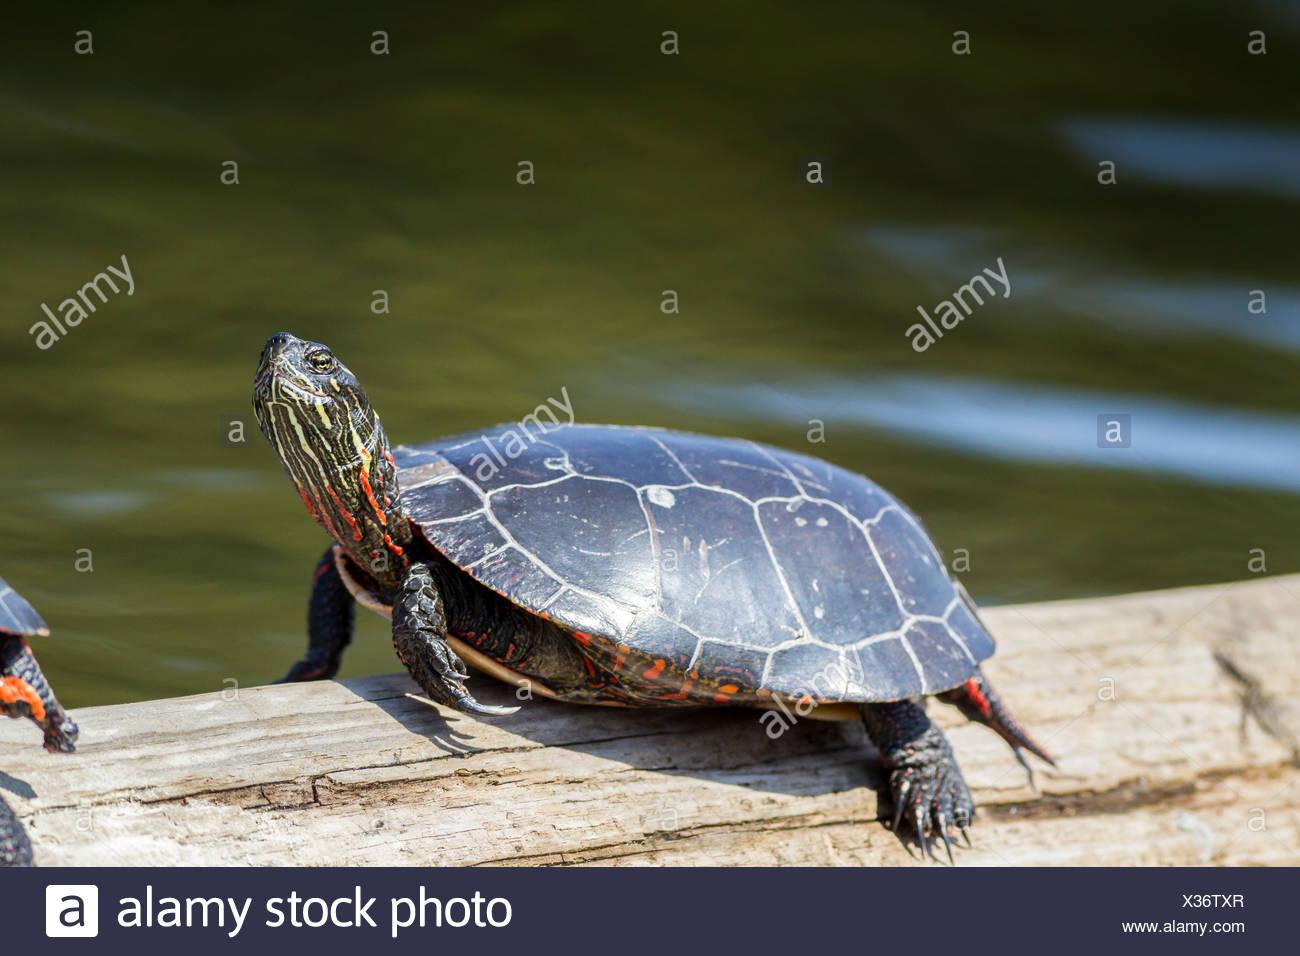 Midland Painted Turtle (Chrysemys picta marginata) sunning, Killarney Provincial Park, Ontario - Stock Image